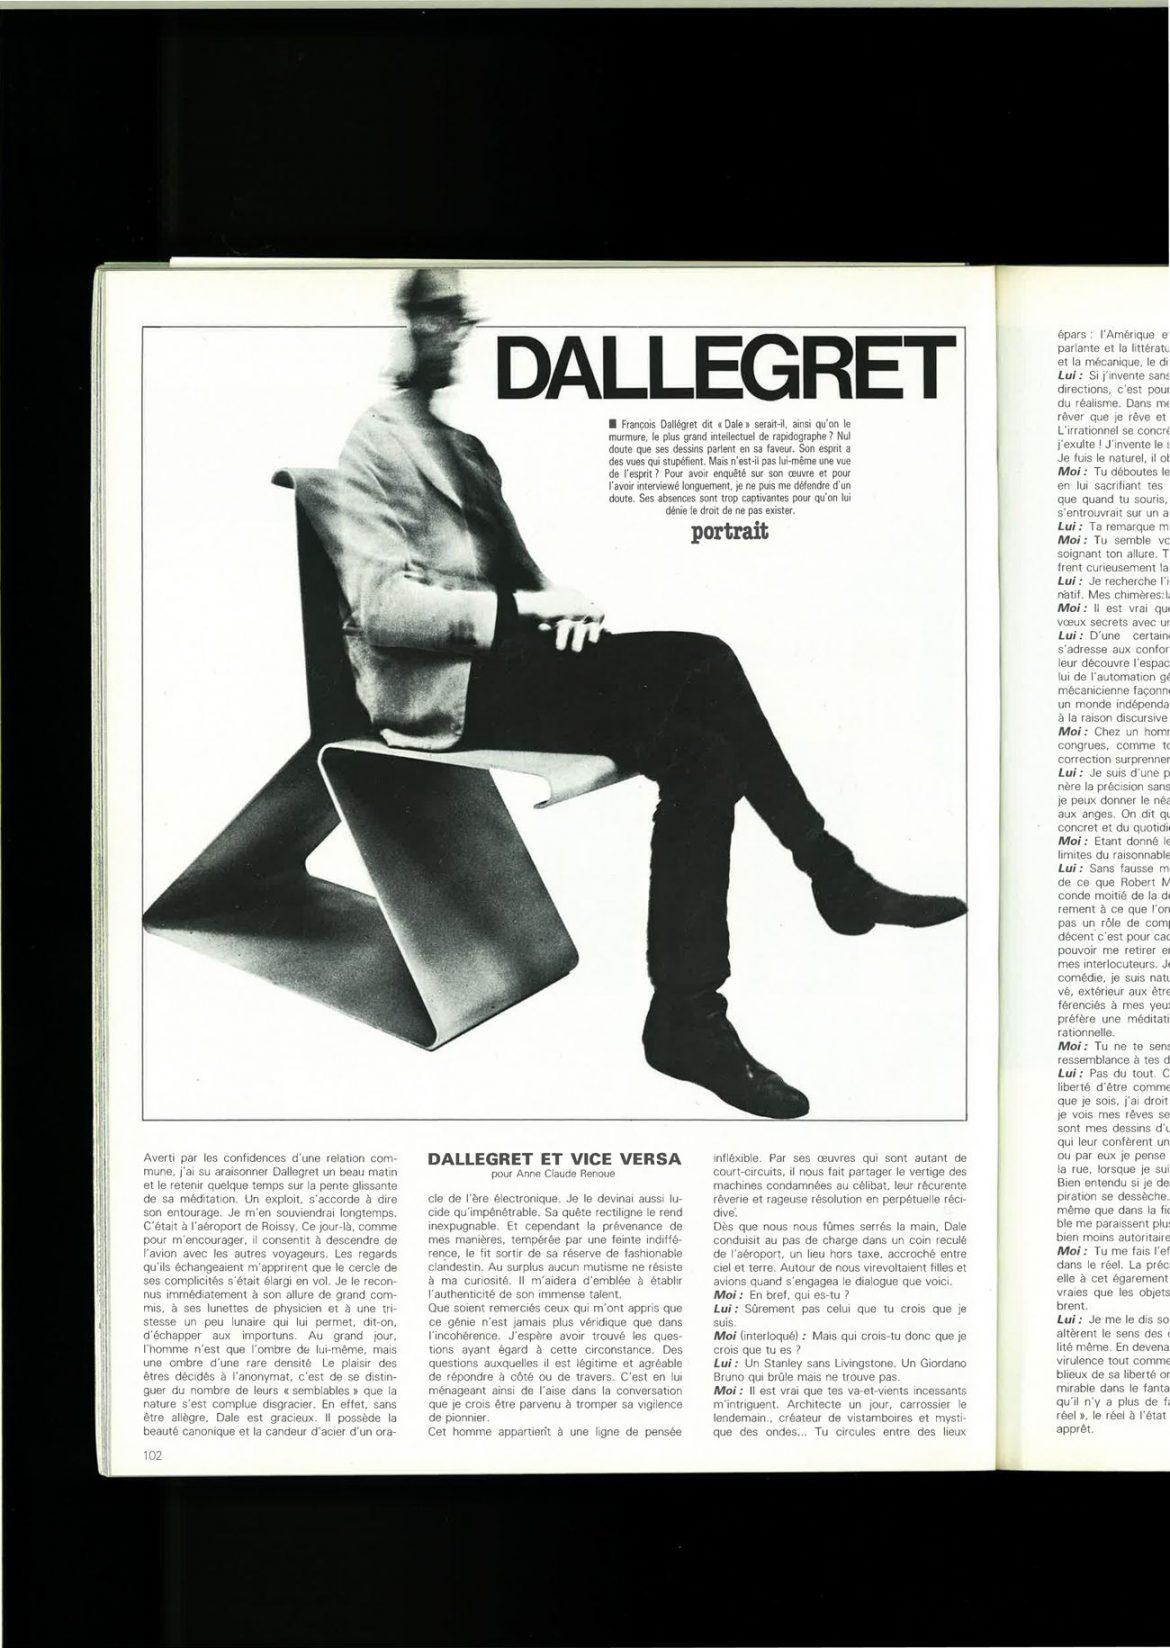 20160620170706 CREE 1 compressed 1170x1648 - Dallegret, 32 ans auparavant